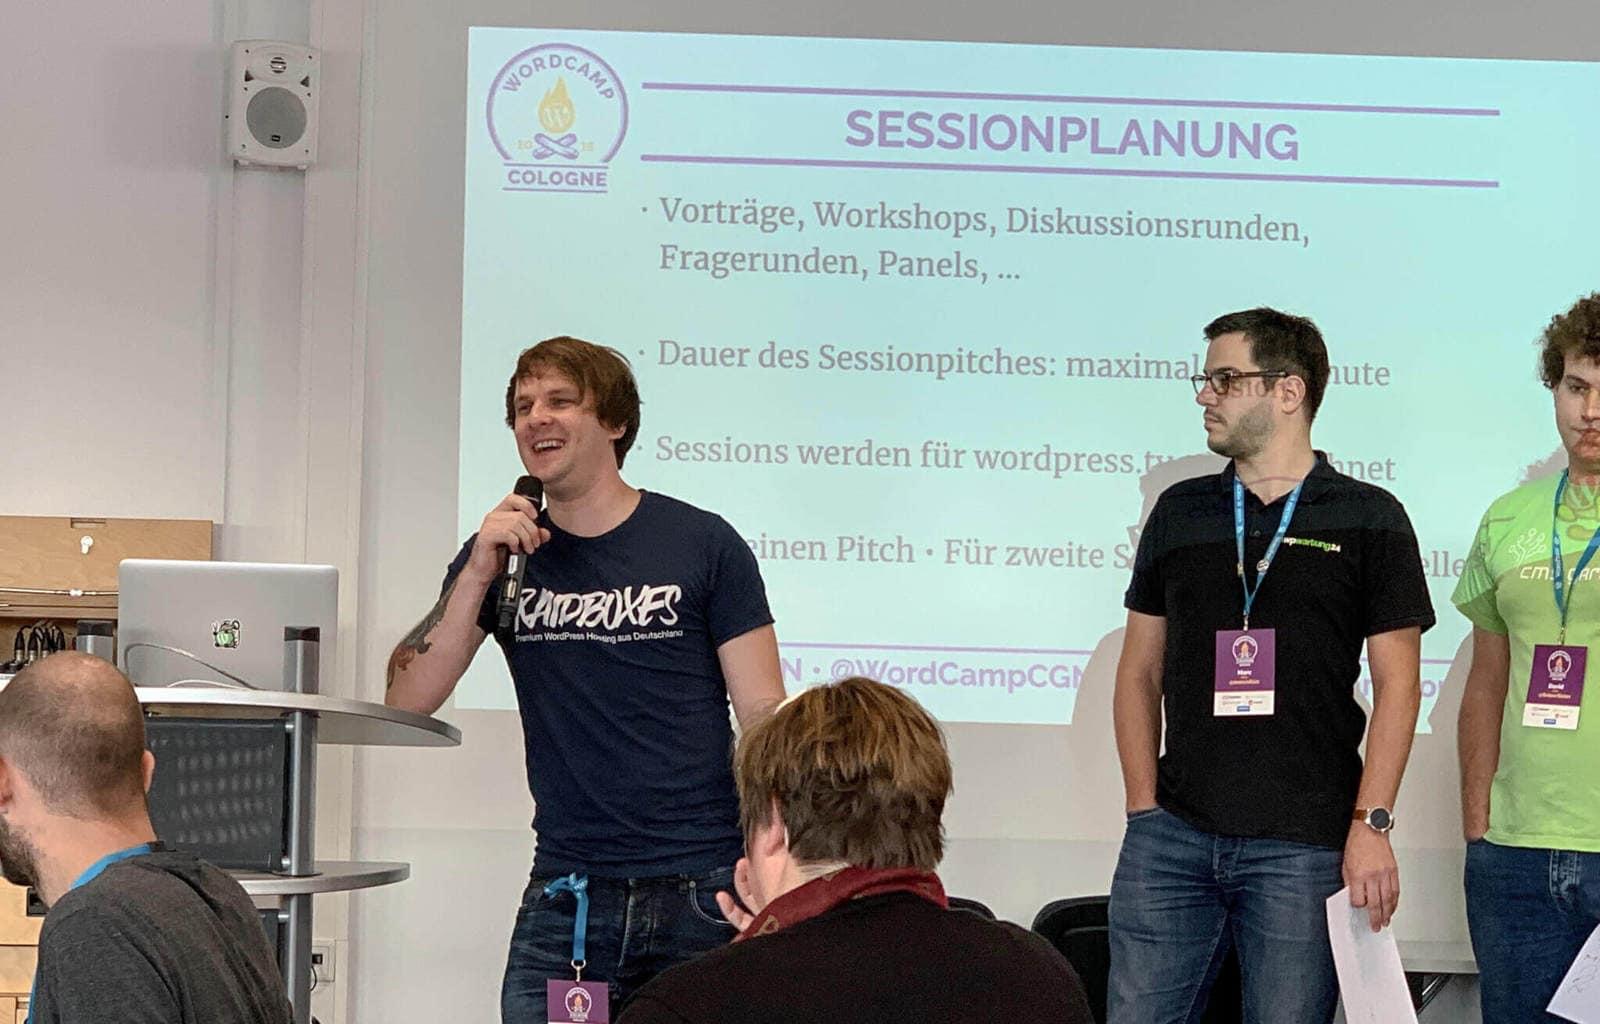 WordCamp Cologne: Matthias von RAIDBOXES na boisku sesji